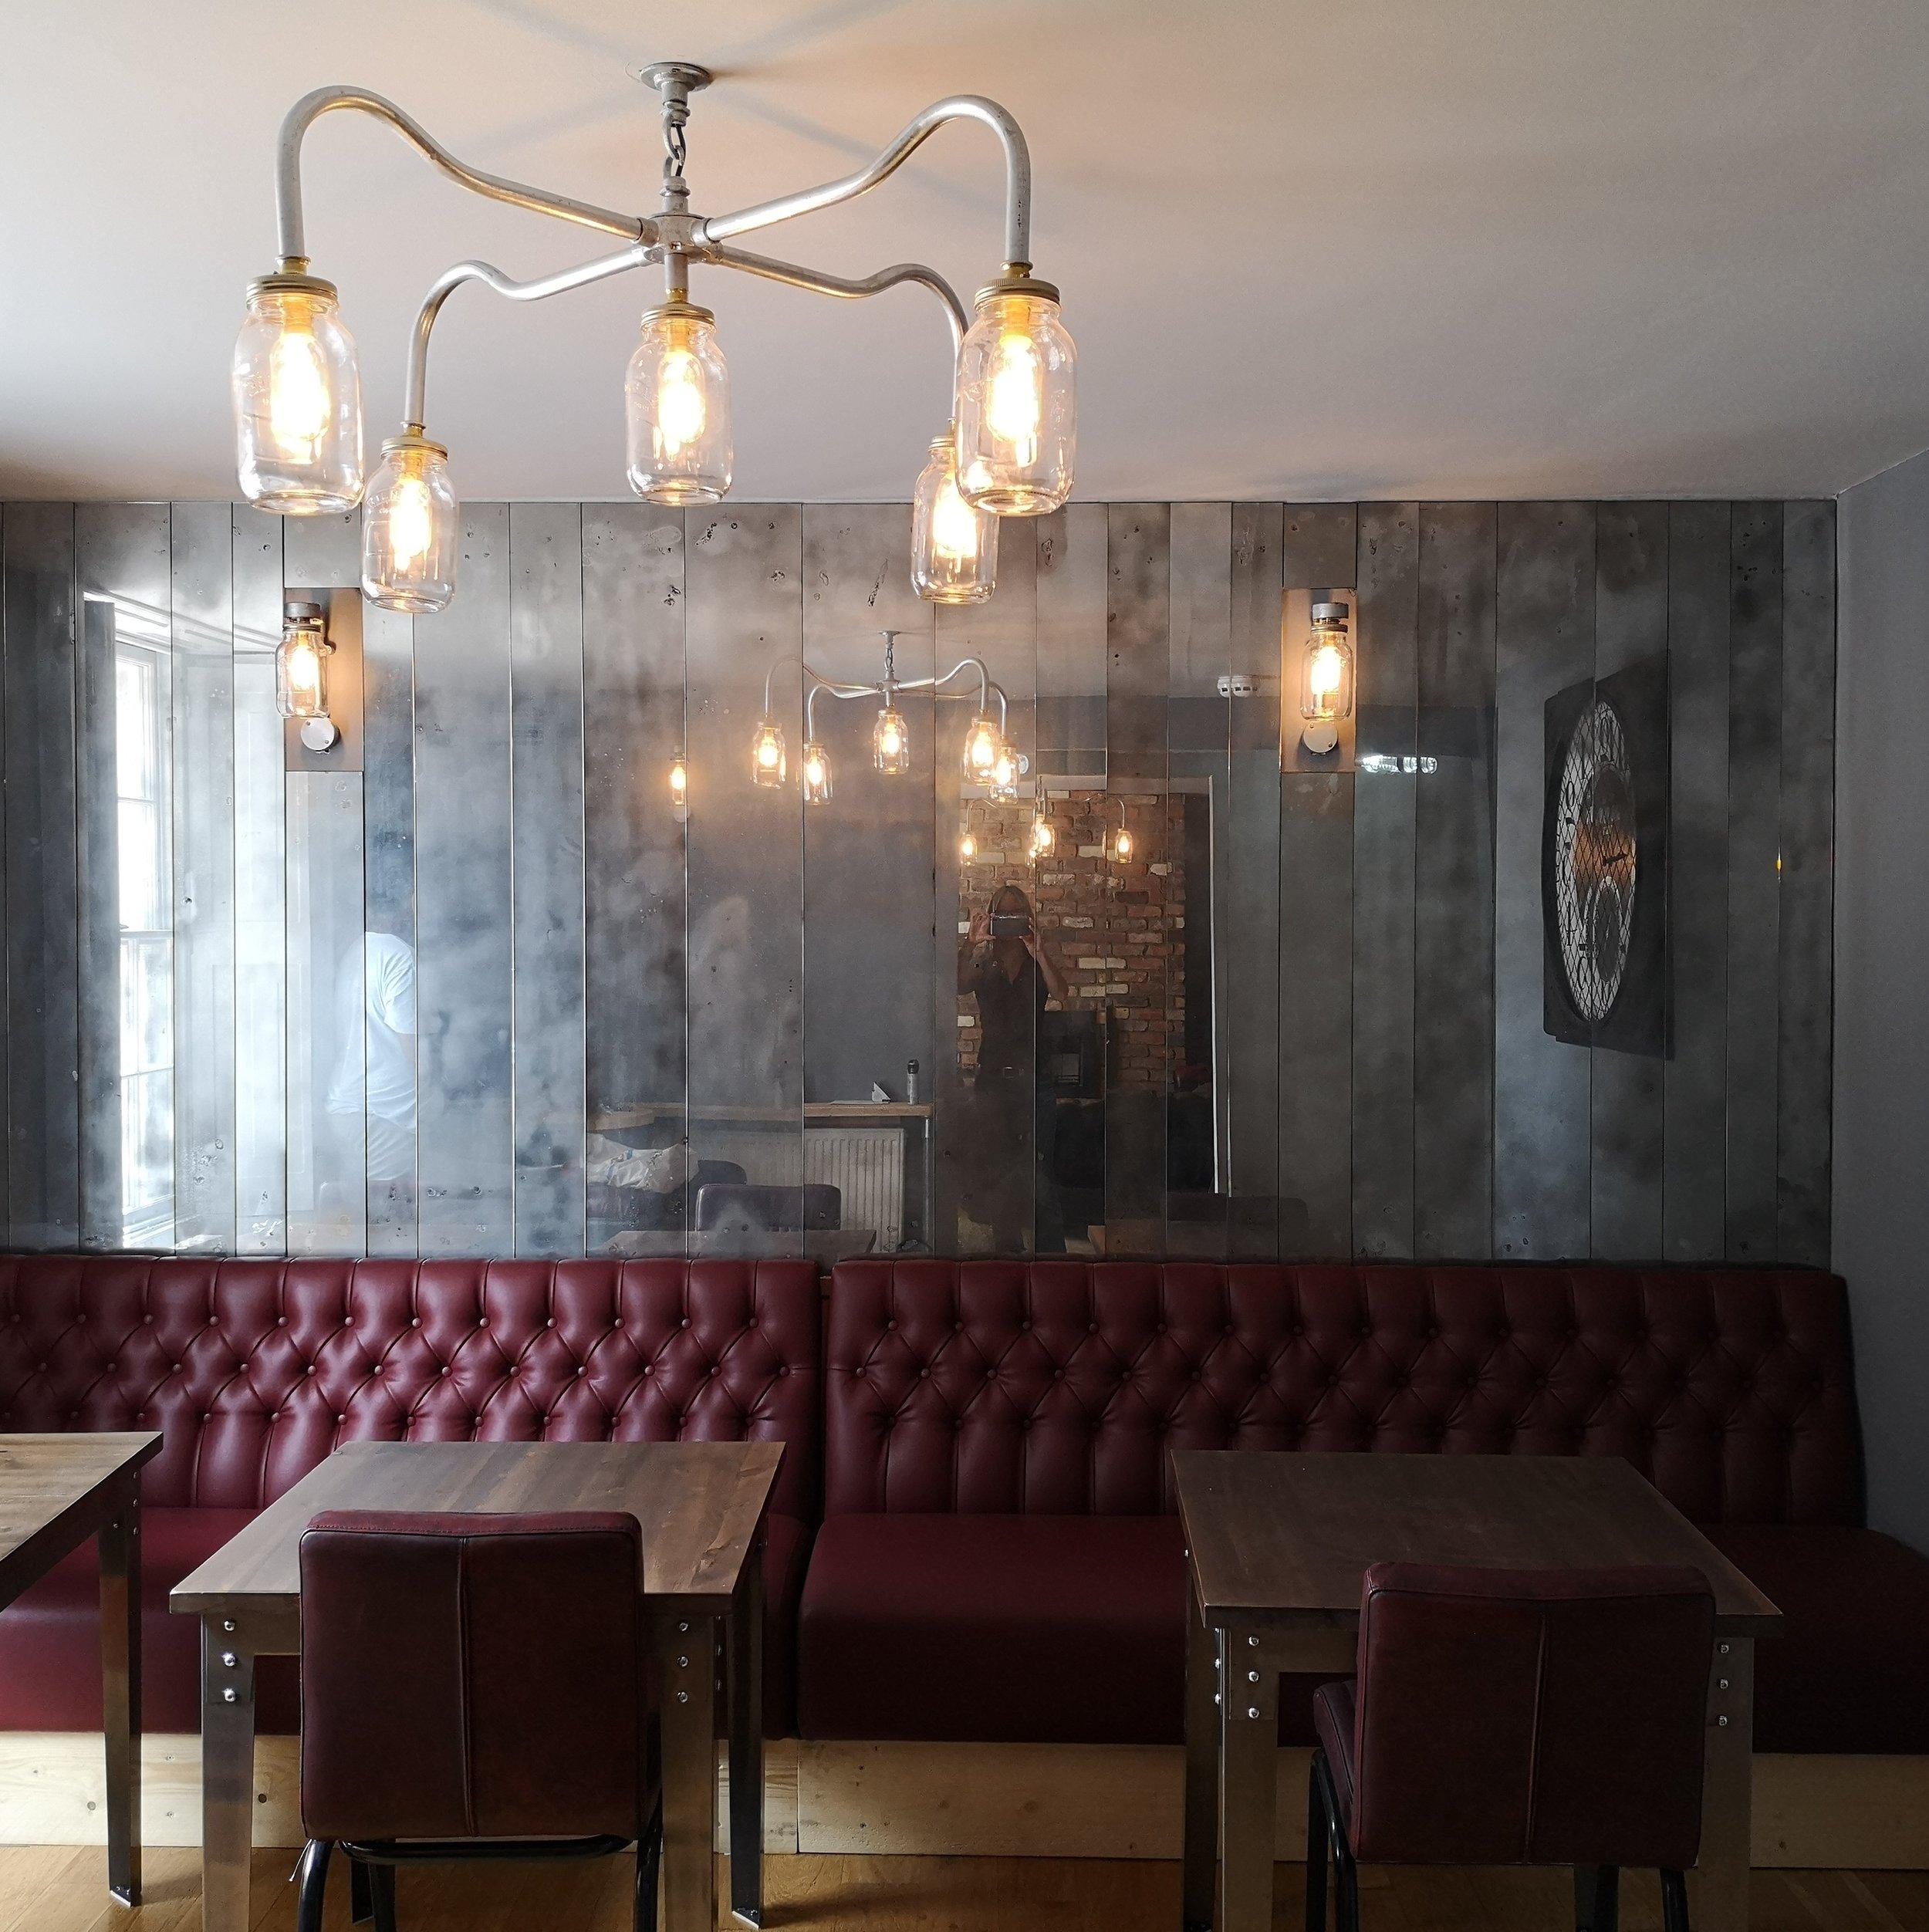 STUDIO_FULTON_Carol_ Fulton_Mirrored_Panels_Craftyard_Aylesbury_IMG_20180721_124356.jpg